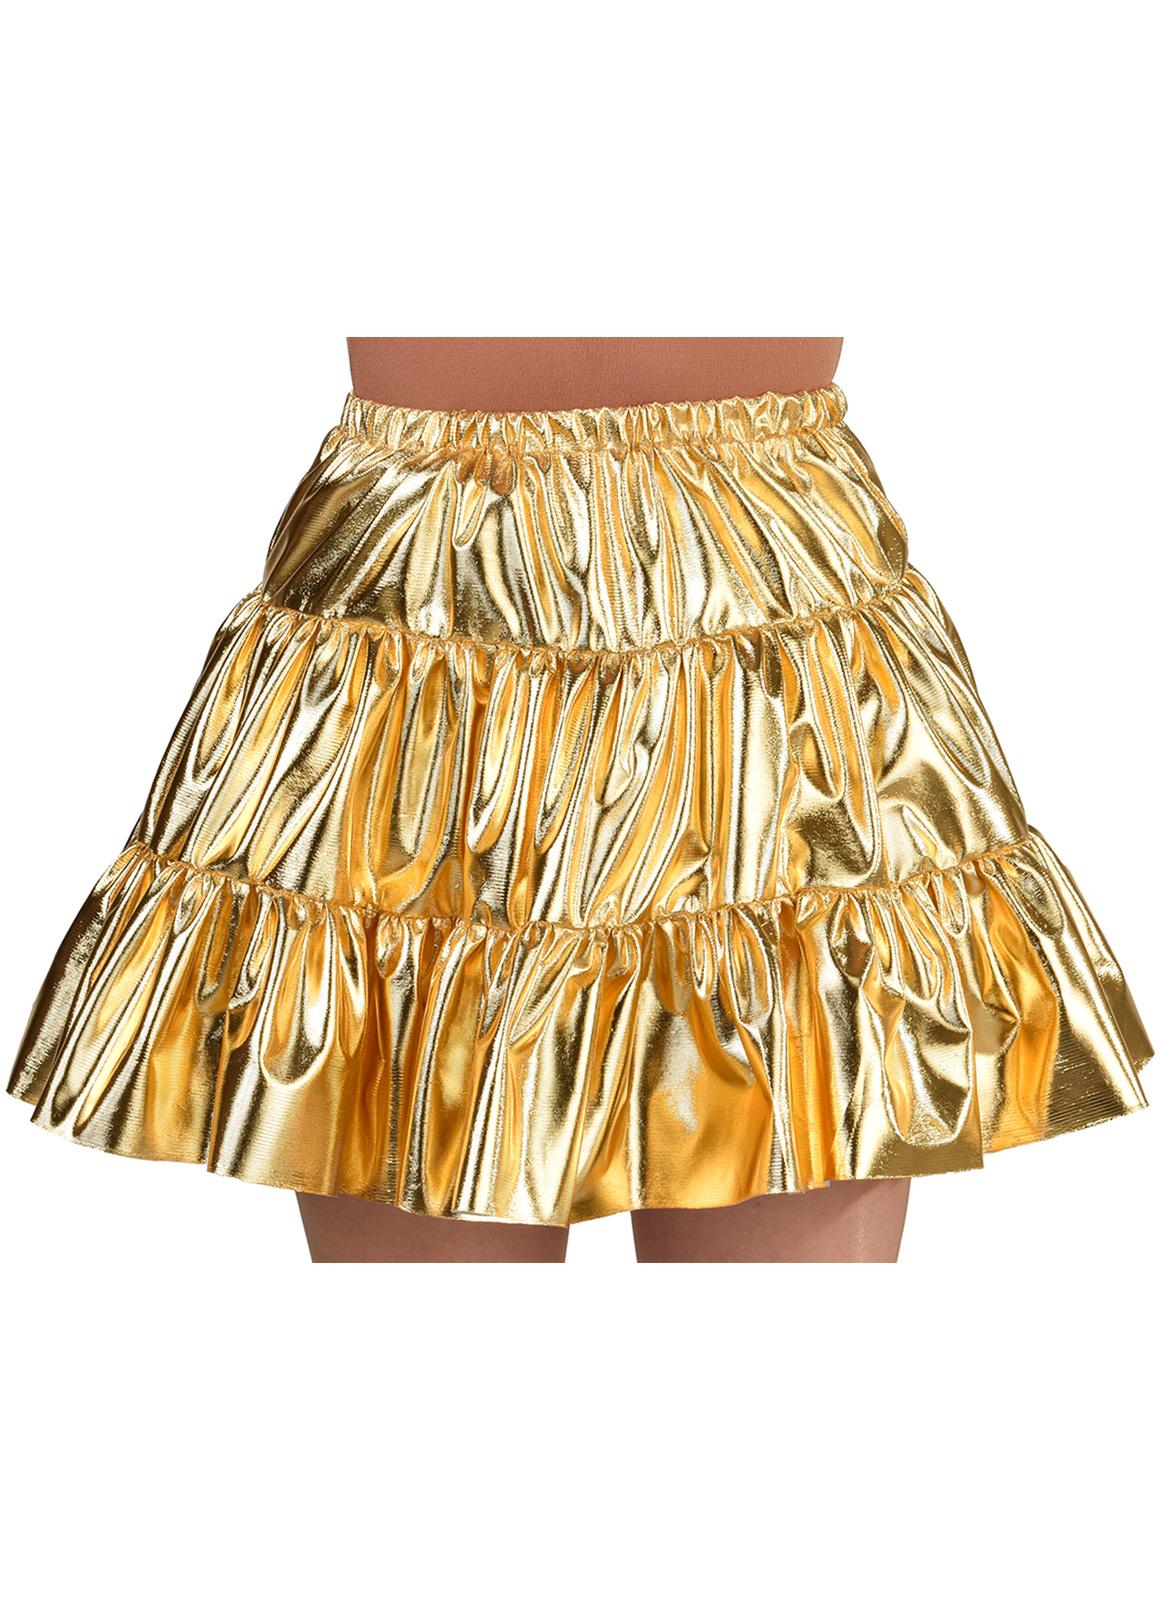 Gouden folie rok